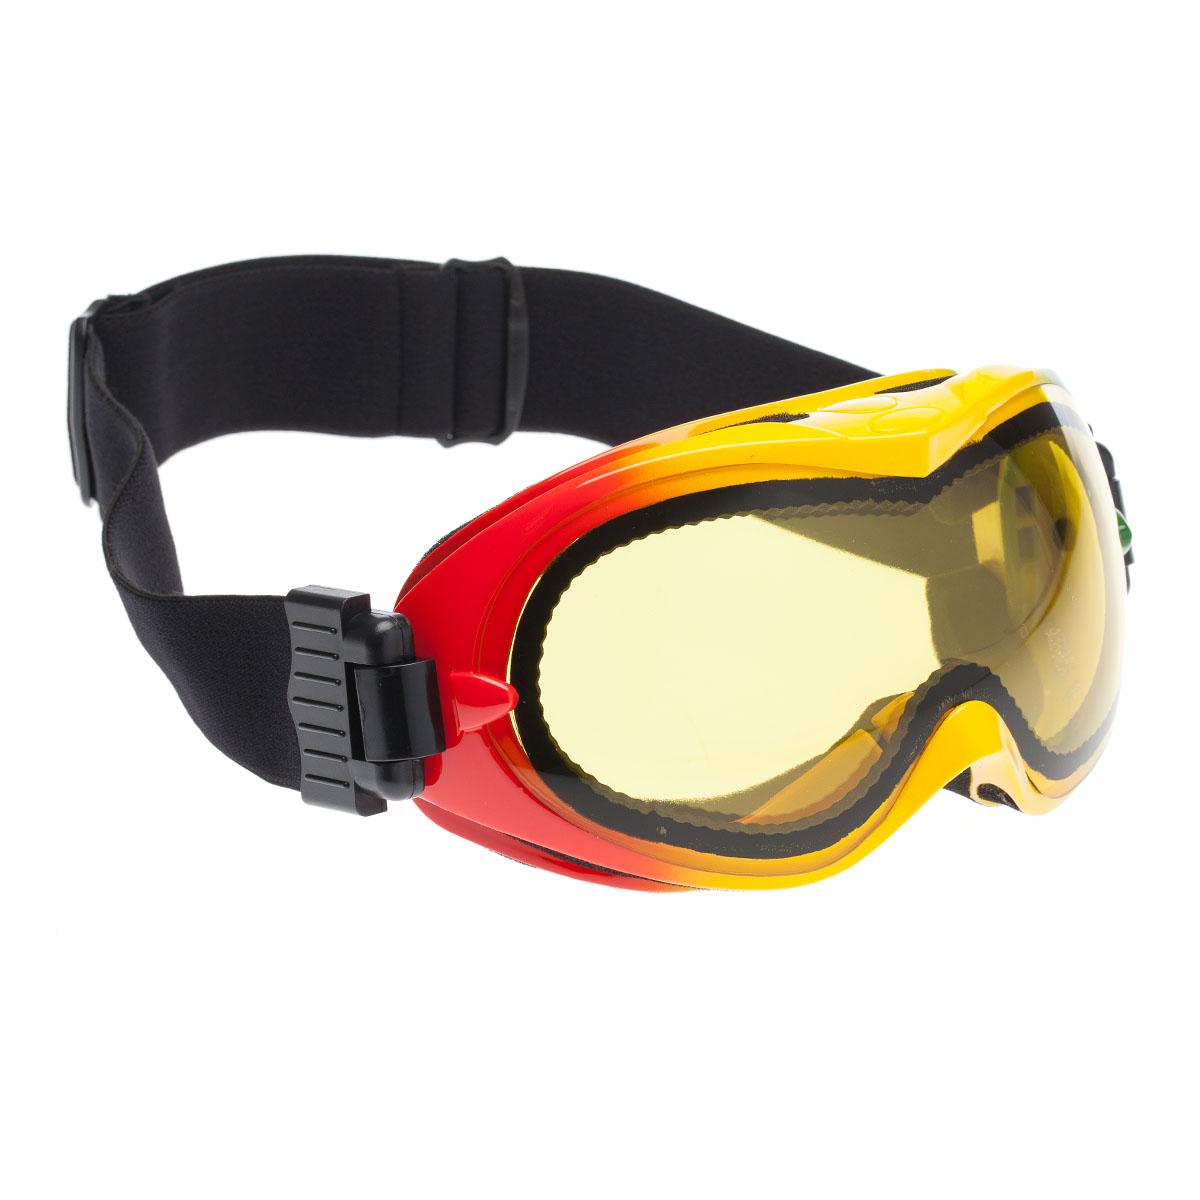 очки горнолыжные vcan ag0172 vse64 Горнолыжные очки Exparc, 15653-3